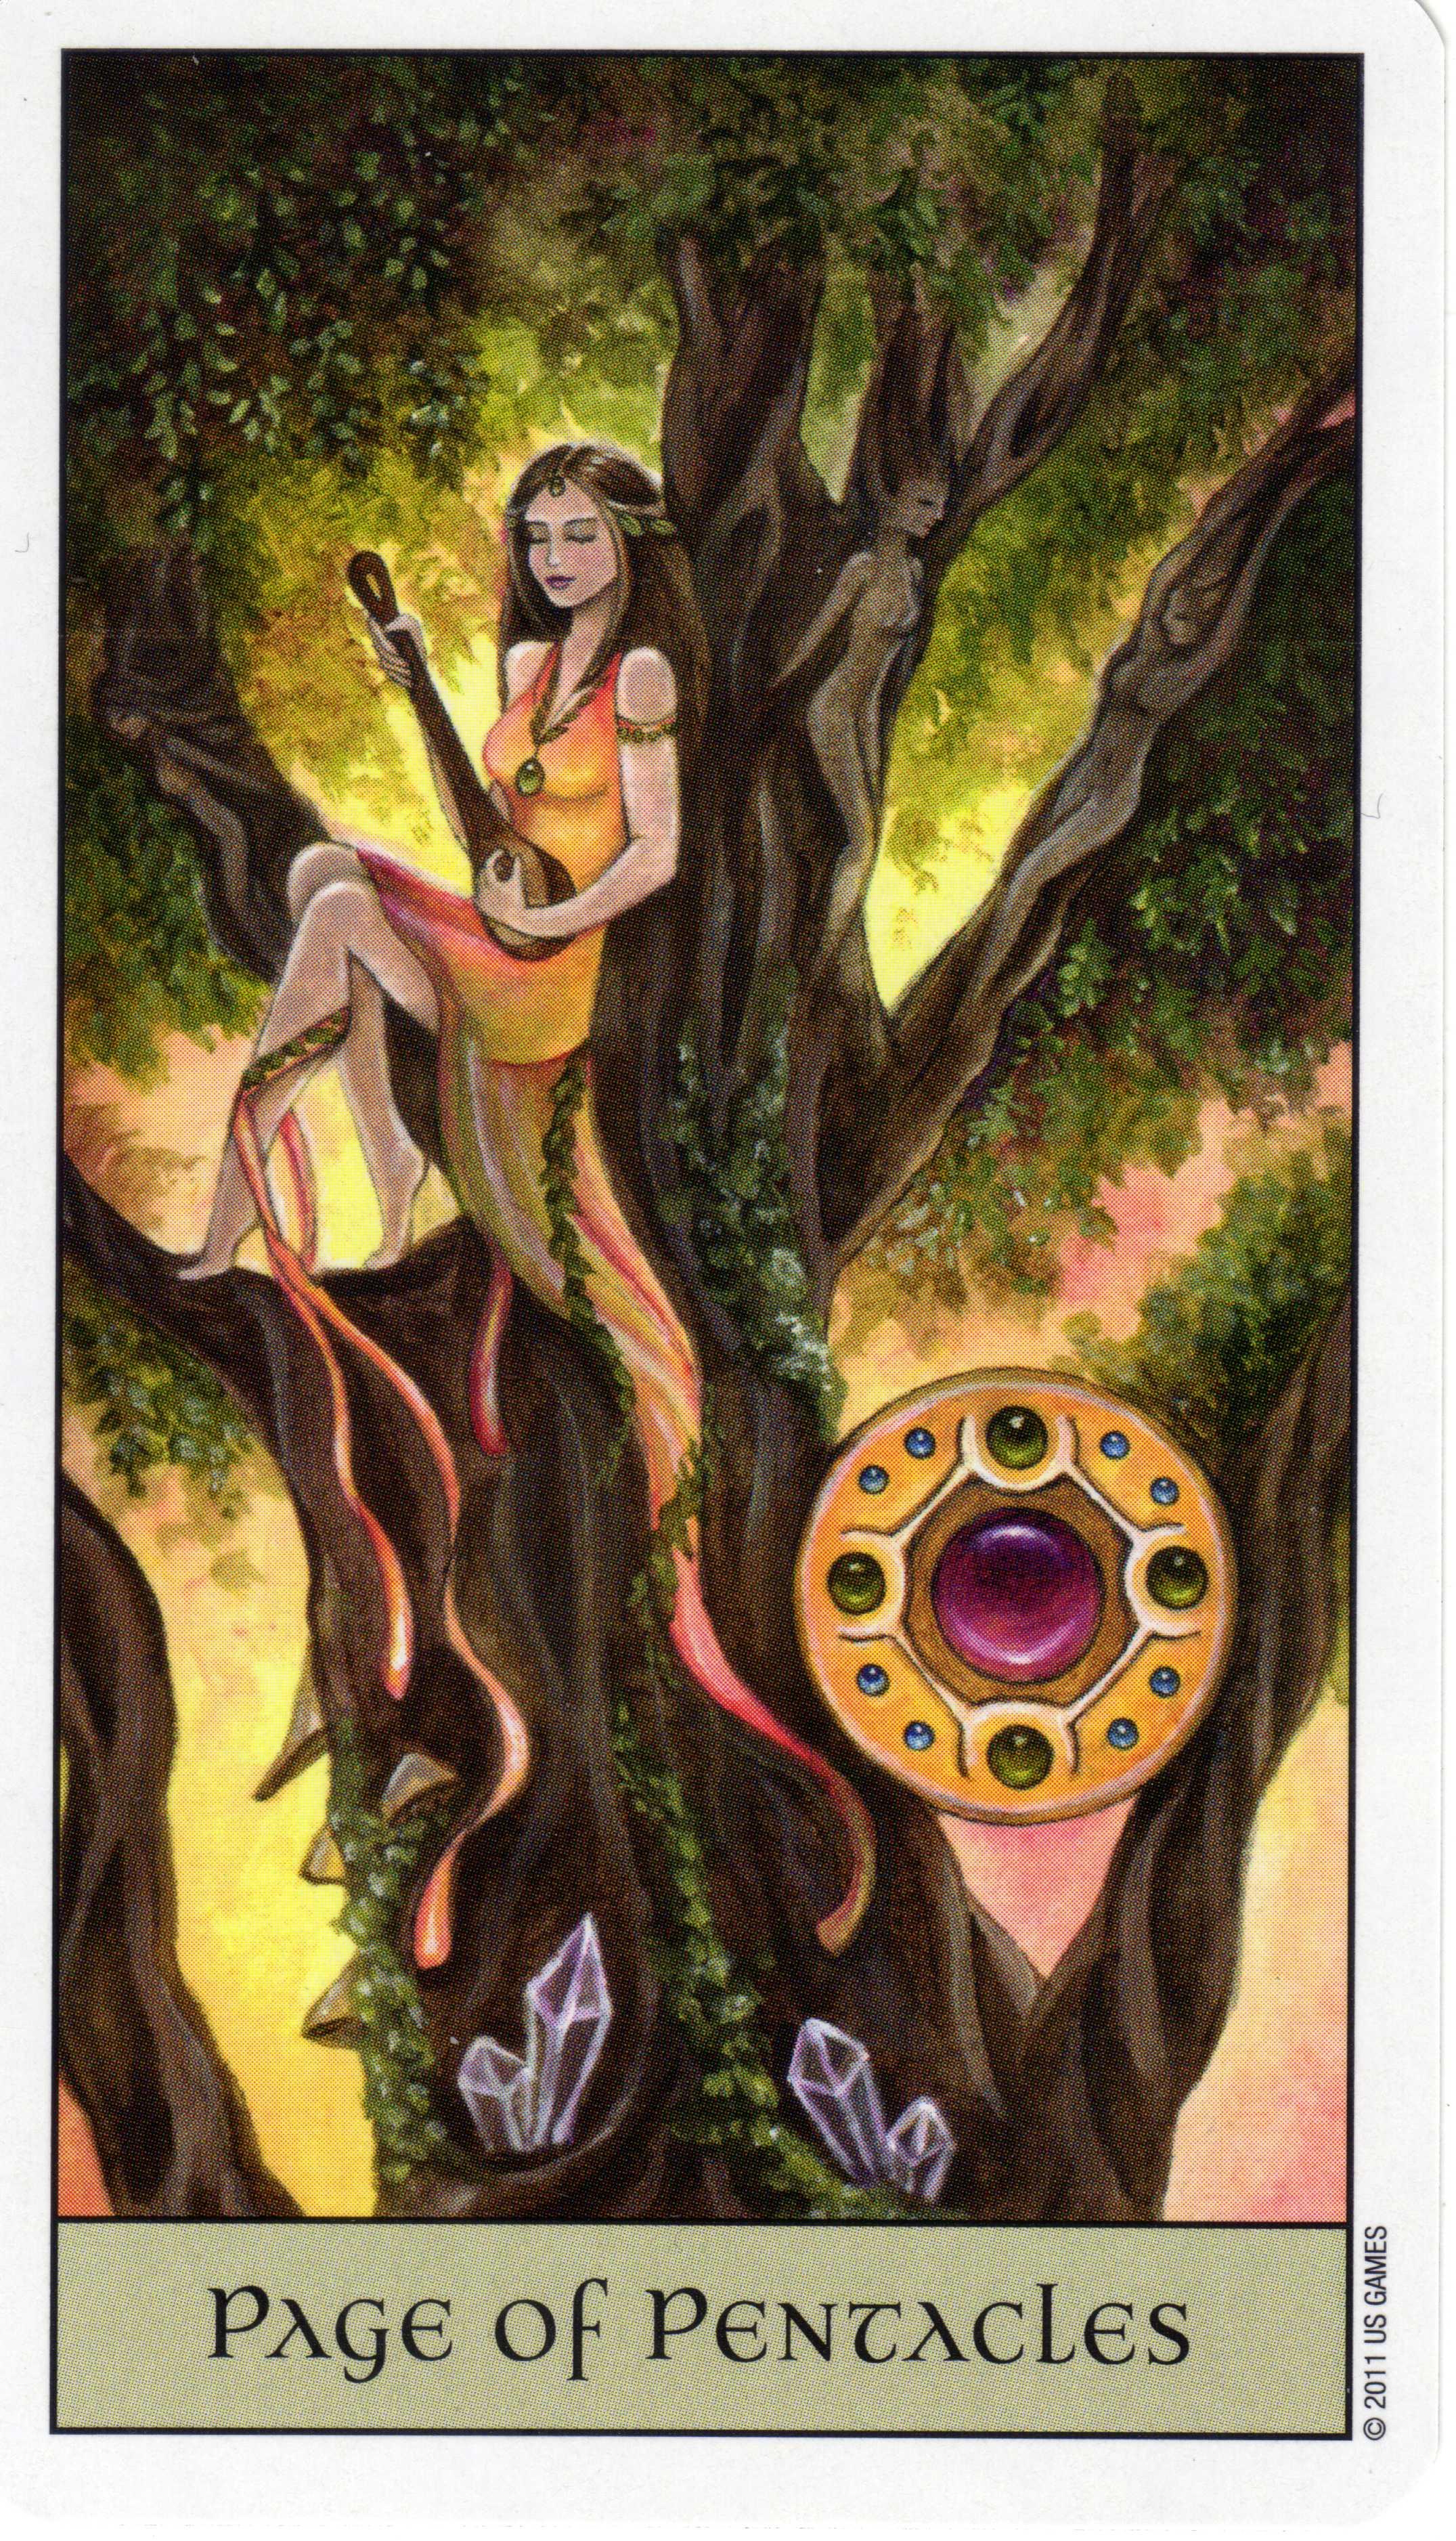 Tarot Of The Legendary: The Crystal Visions Tarot